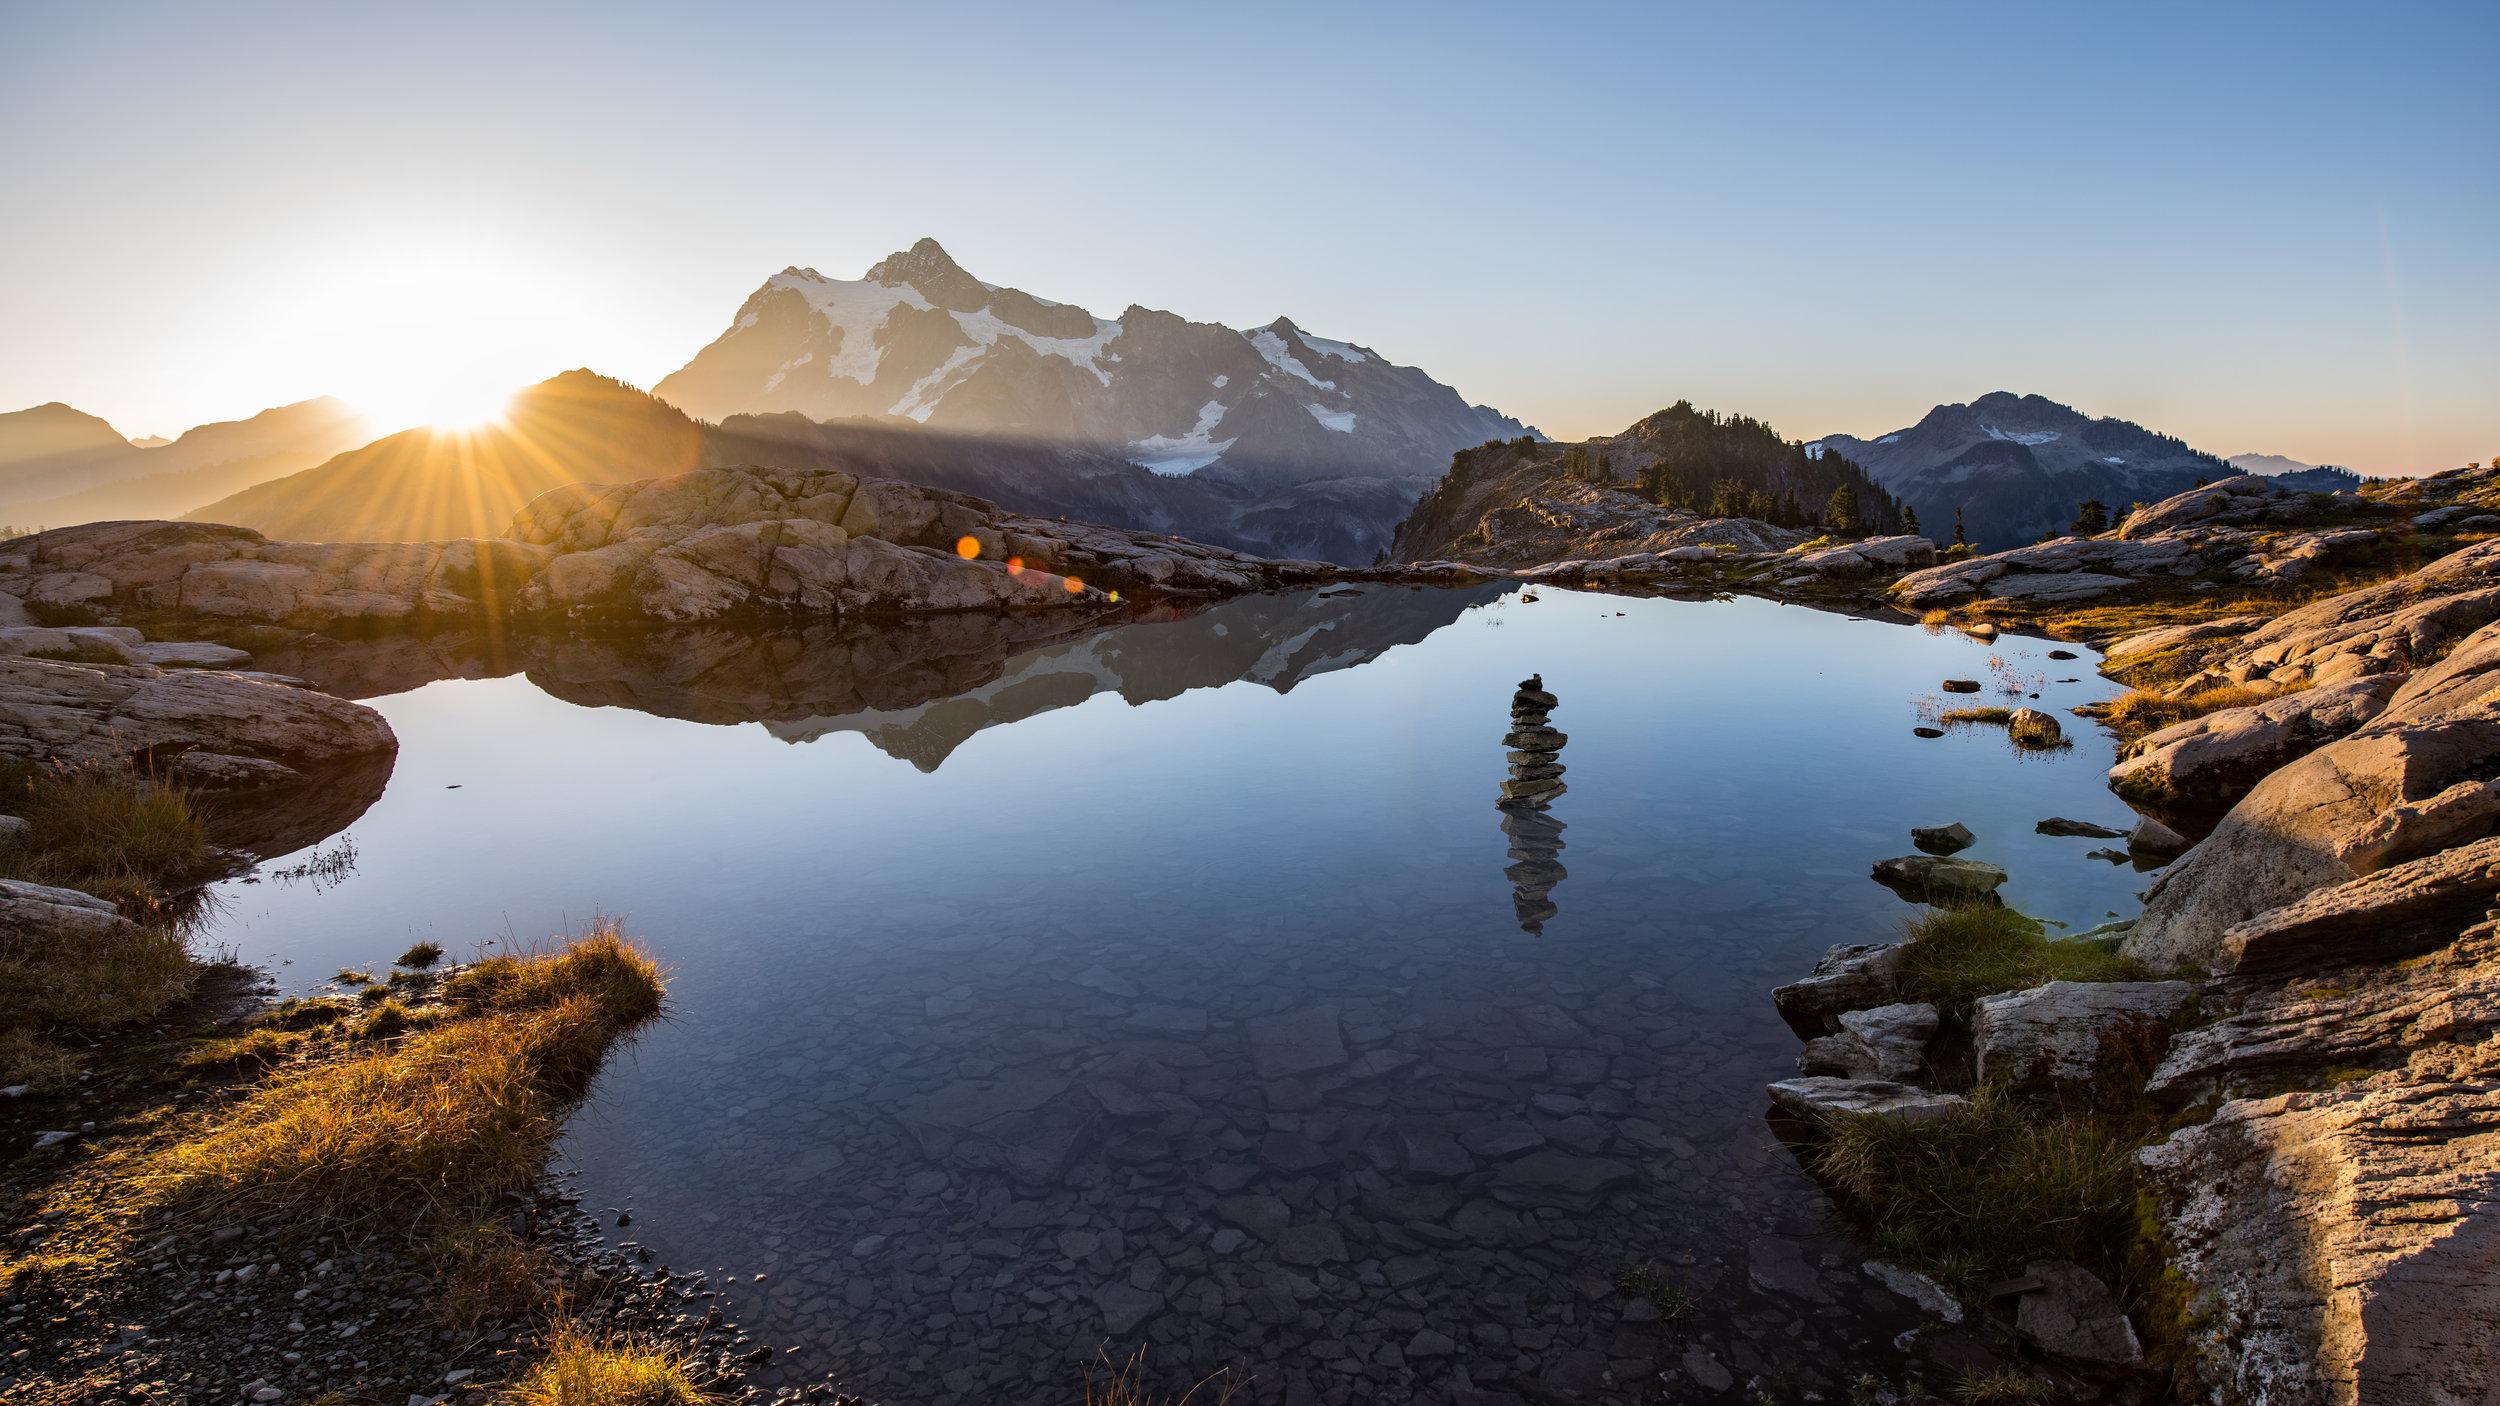 Sunrise over Mount Shuksan